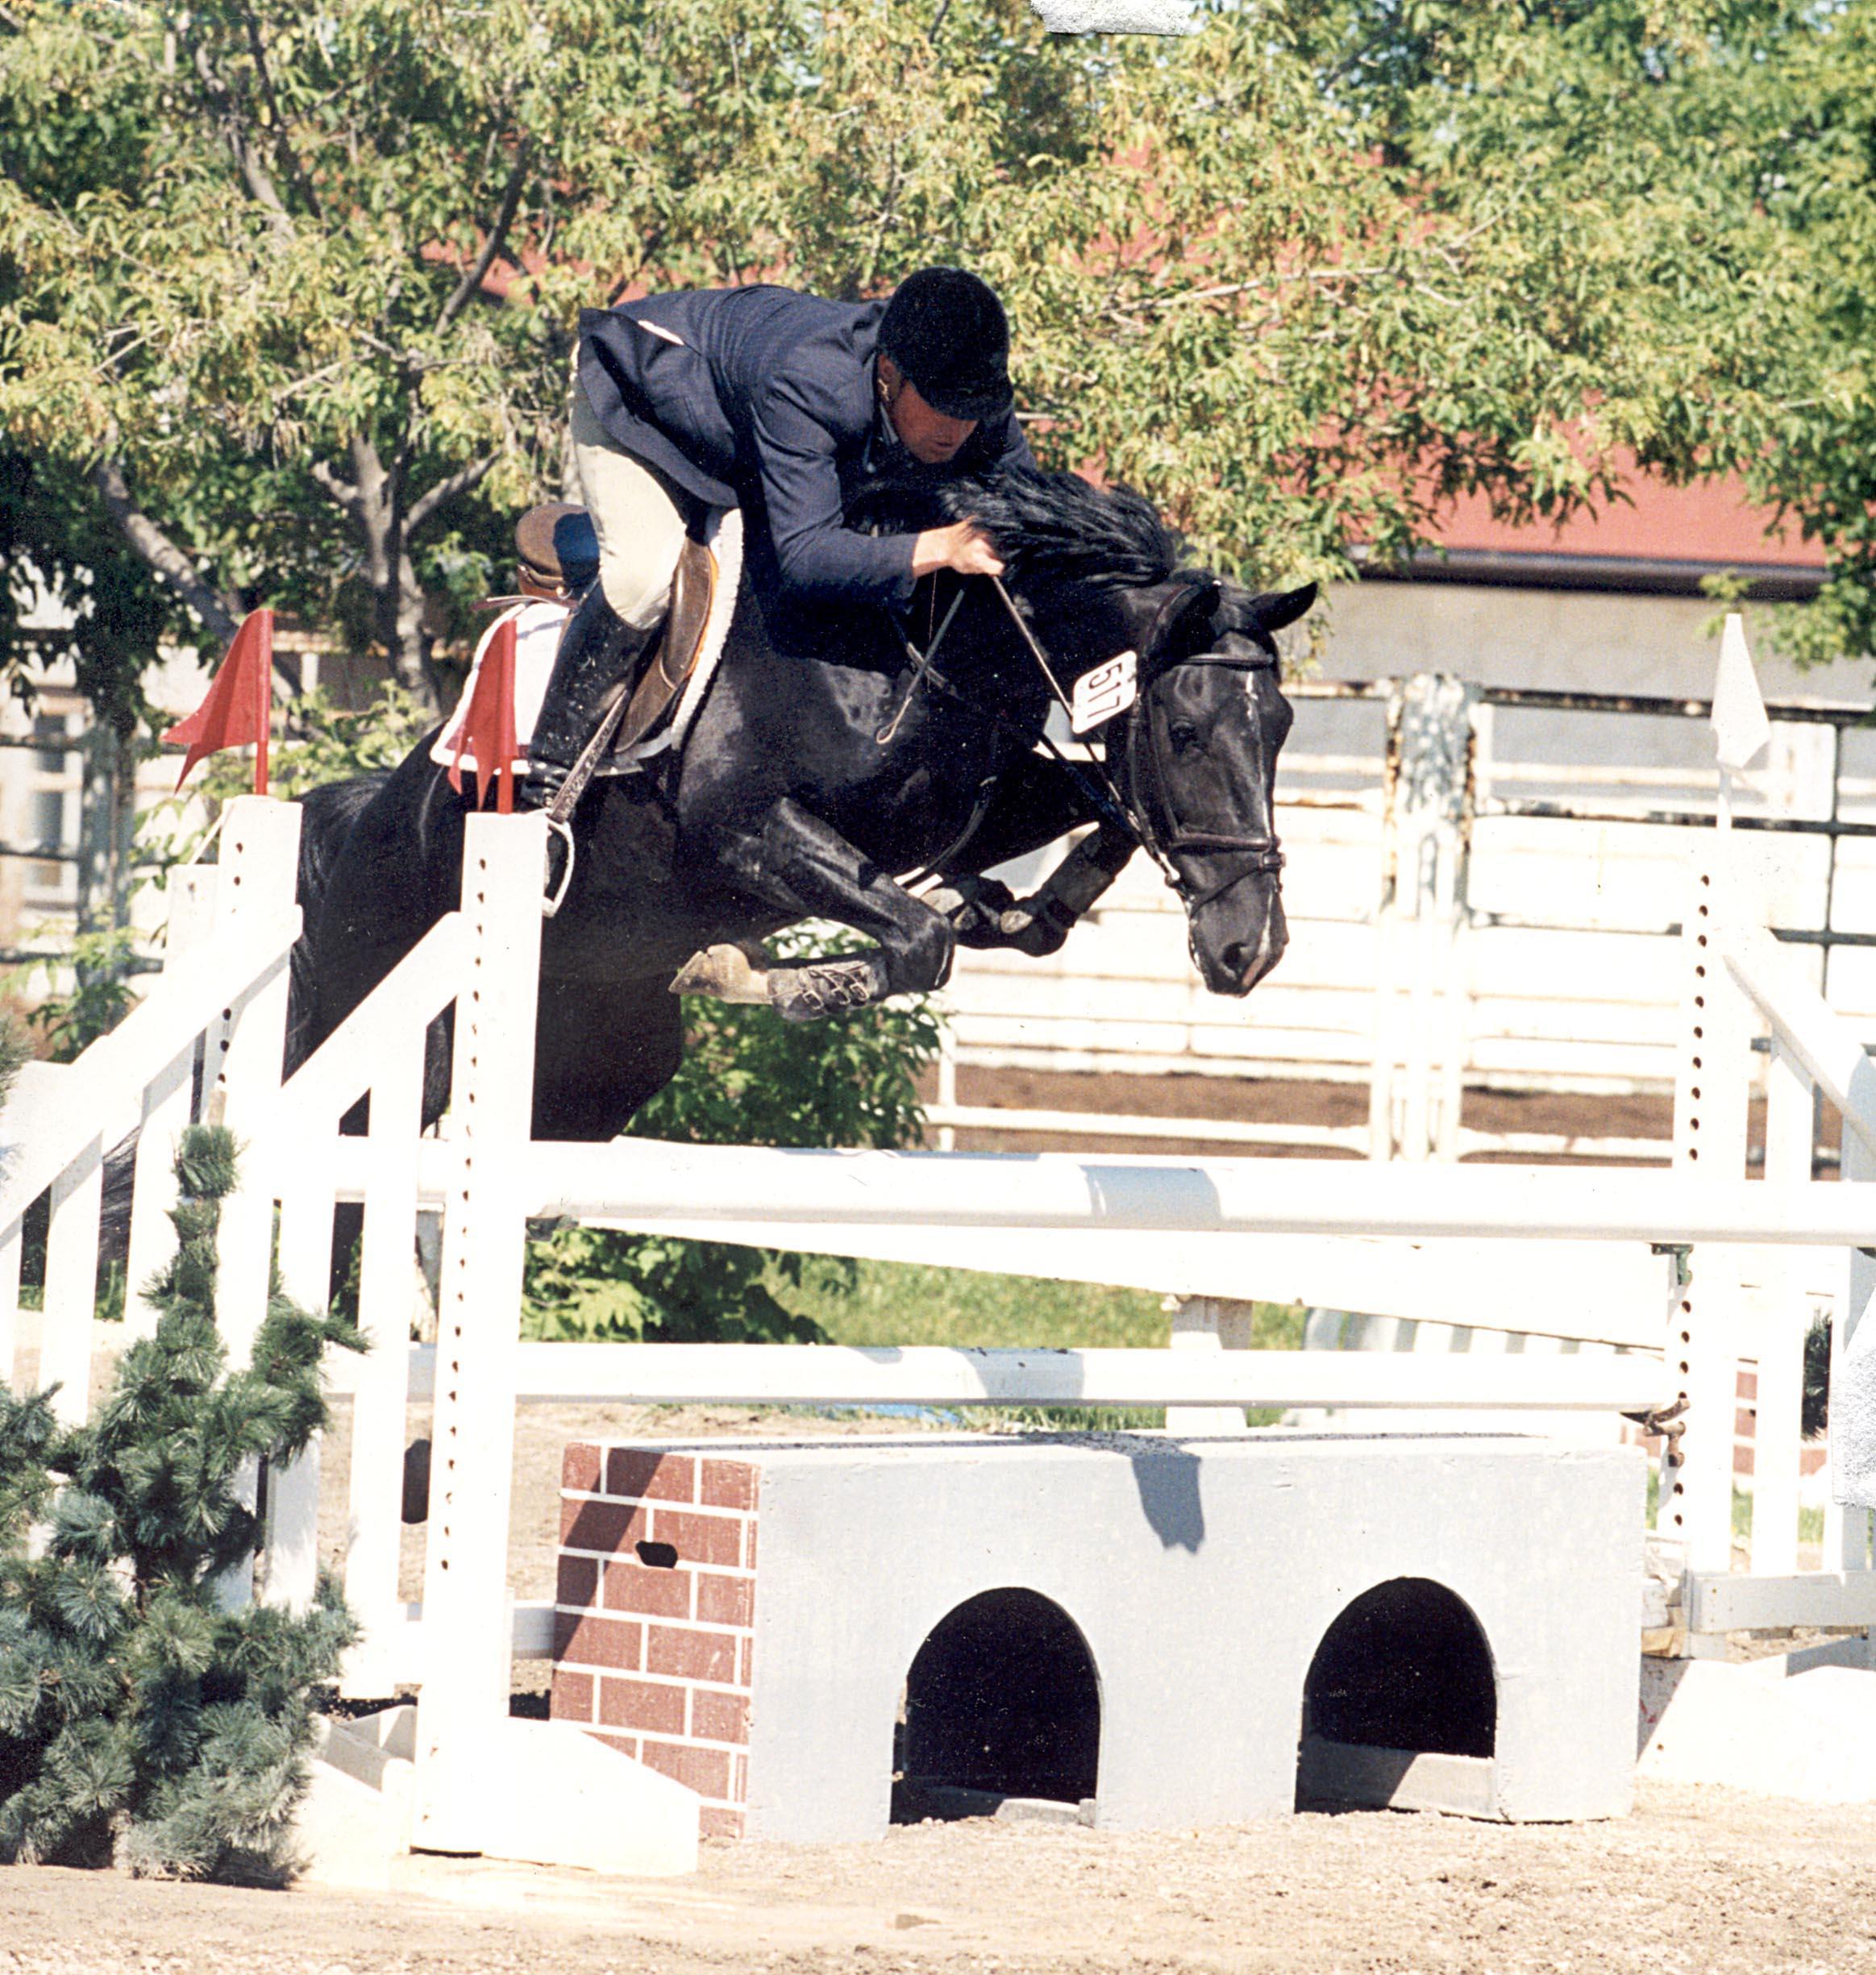 Halconero jumping front